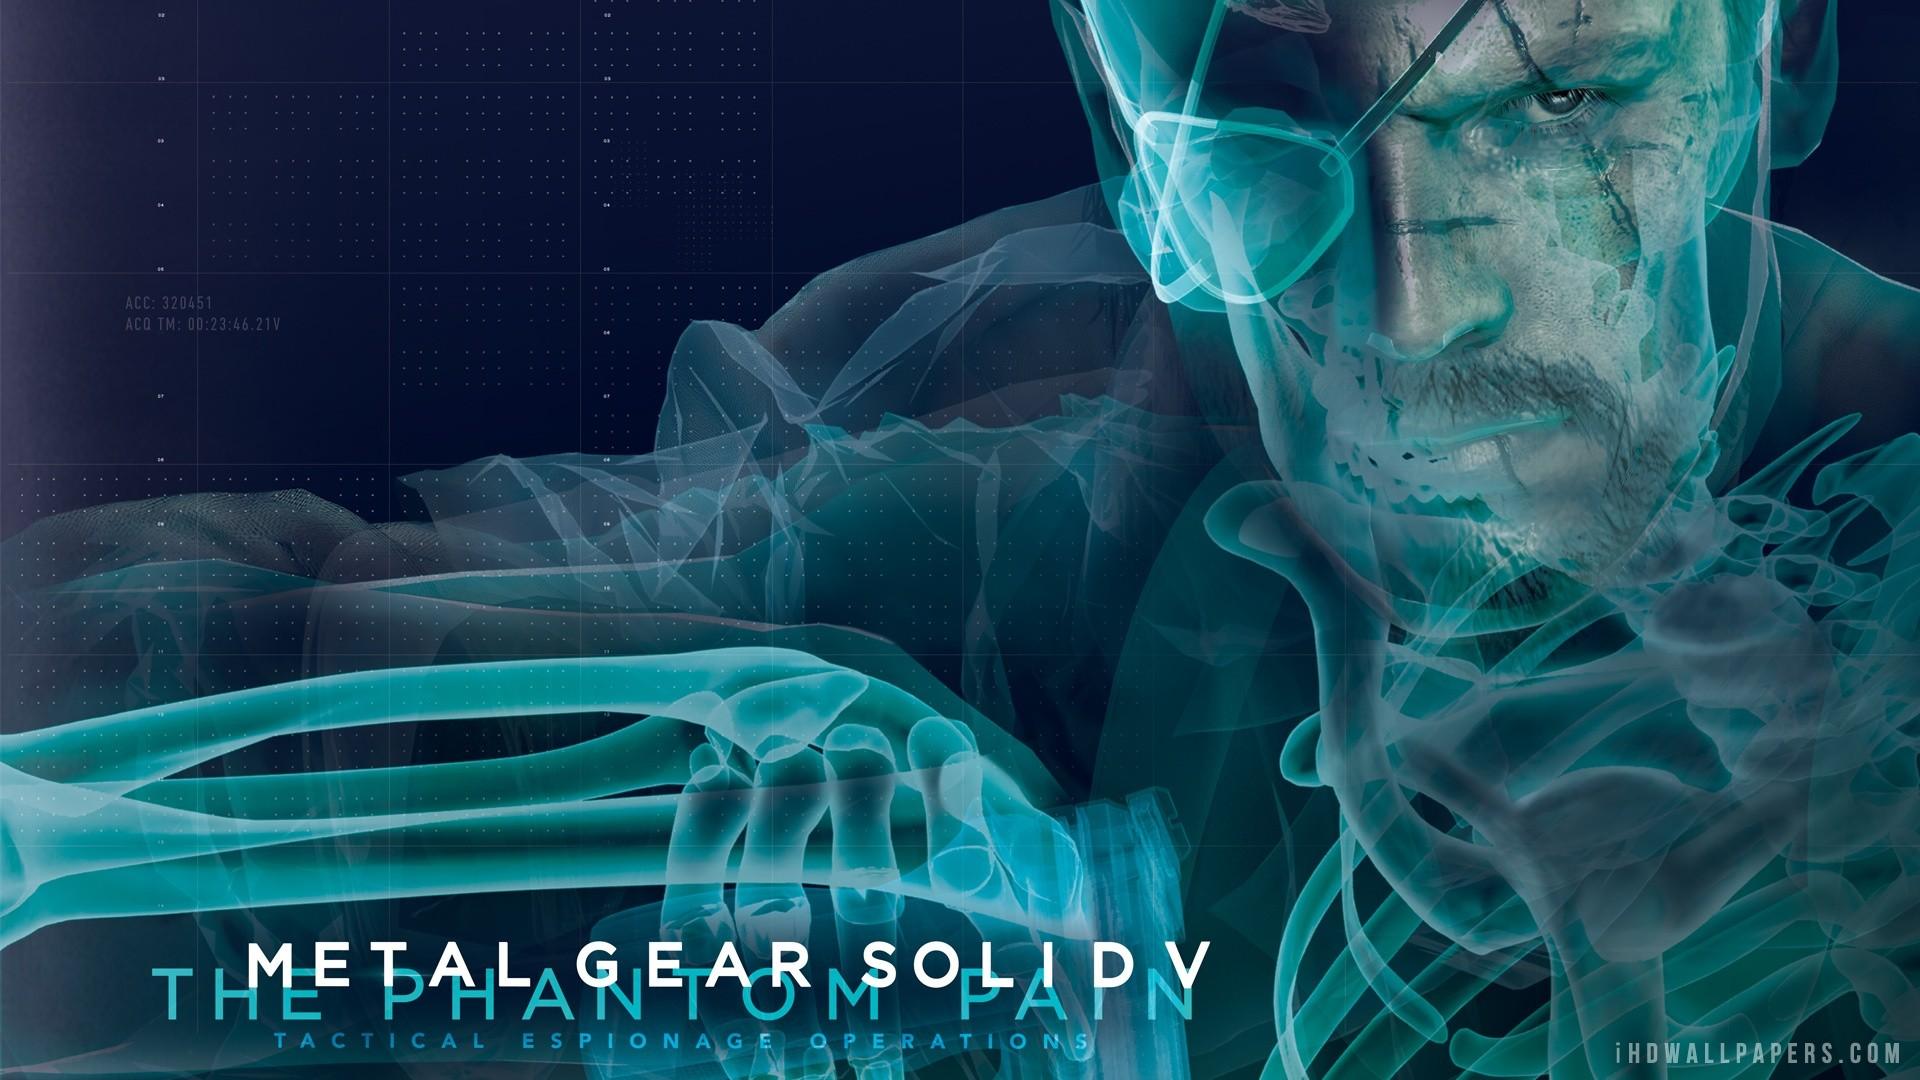 Metal Gear Solid 5 The Phantom Pain HD Wallpaper – iHD Wallpapers